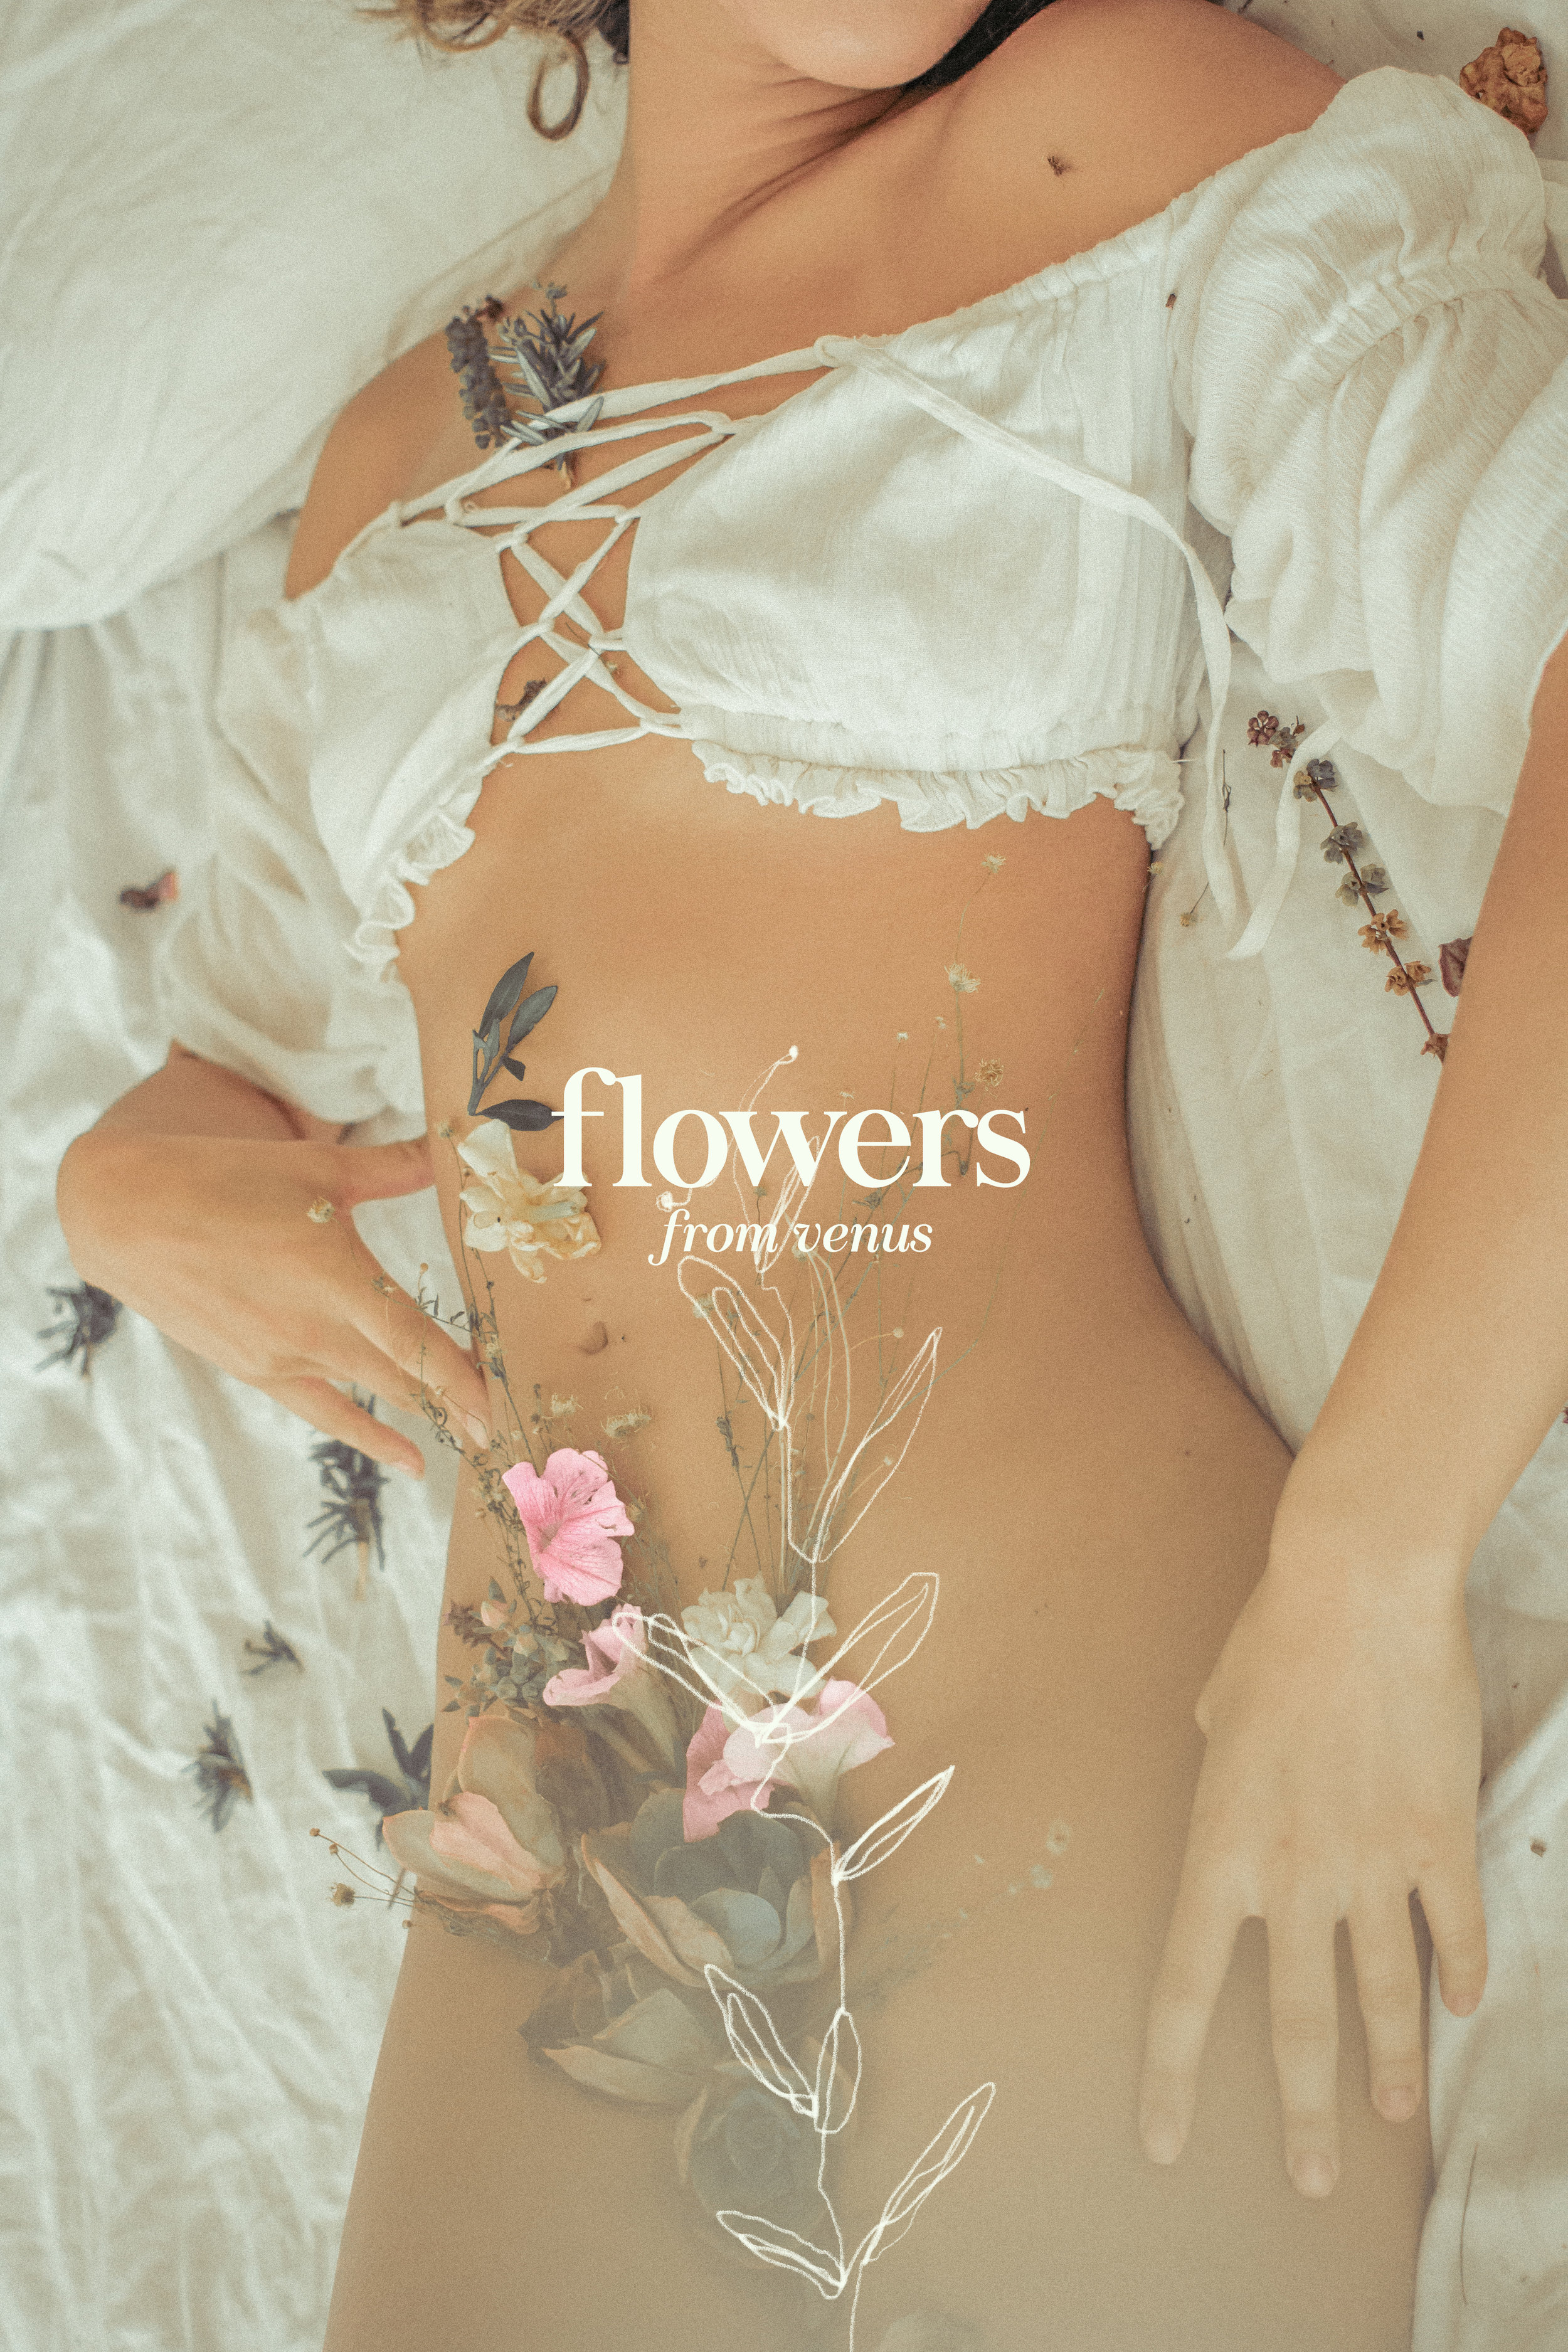 flowersfromvenus.jpg